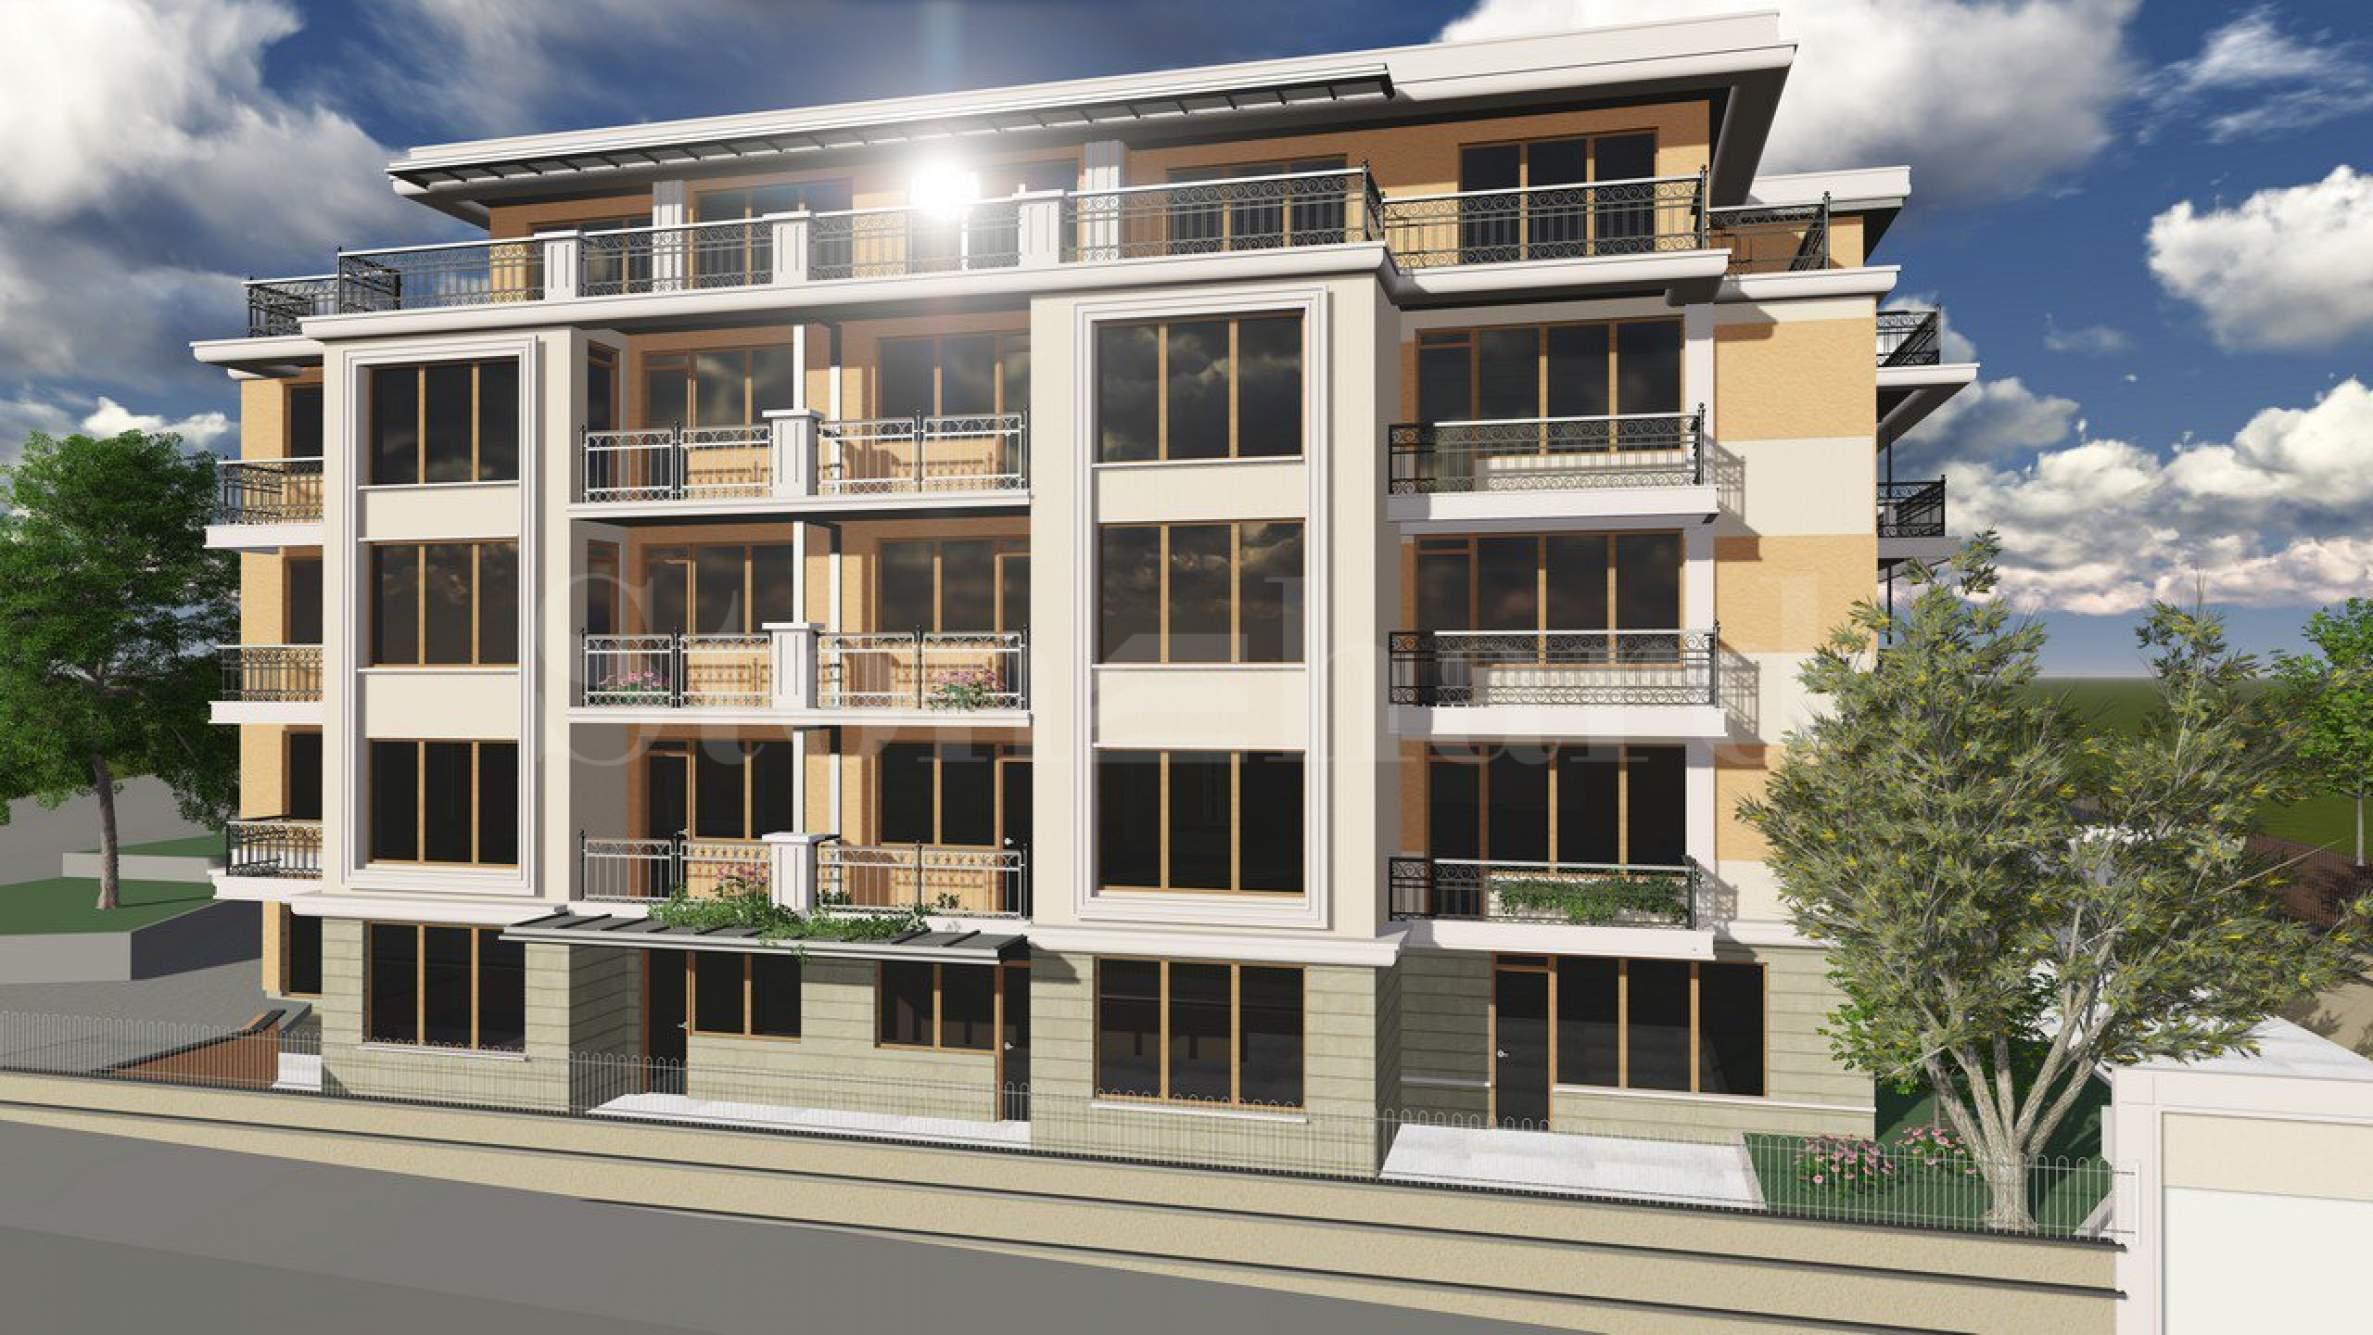 New studios and apartments near oak forest1 - Stonehard